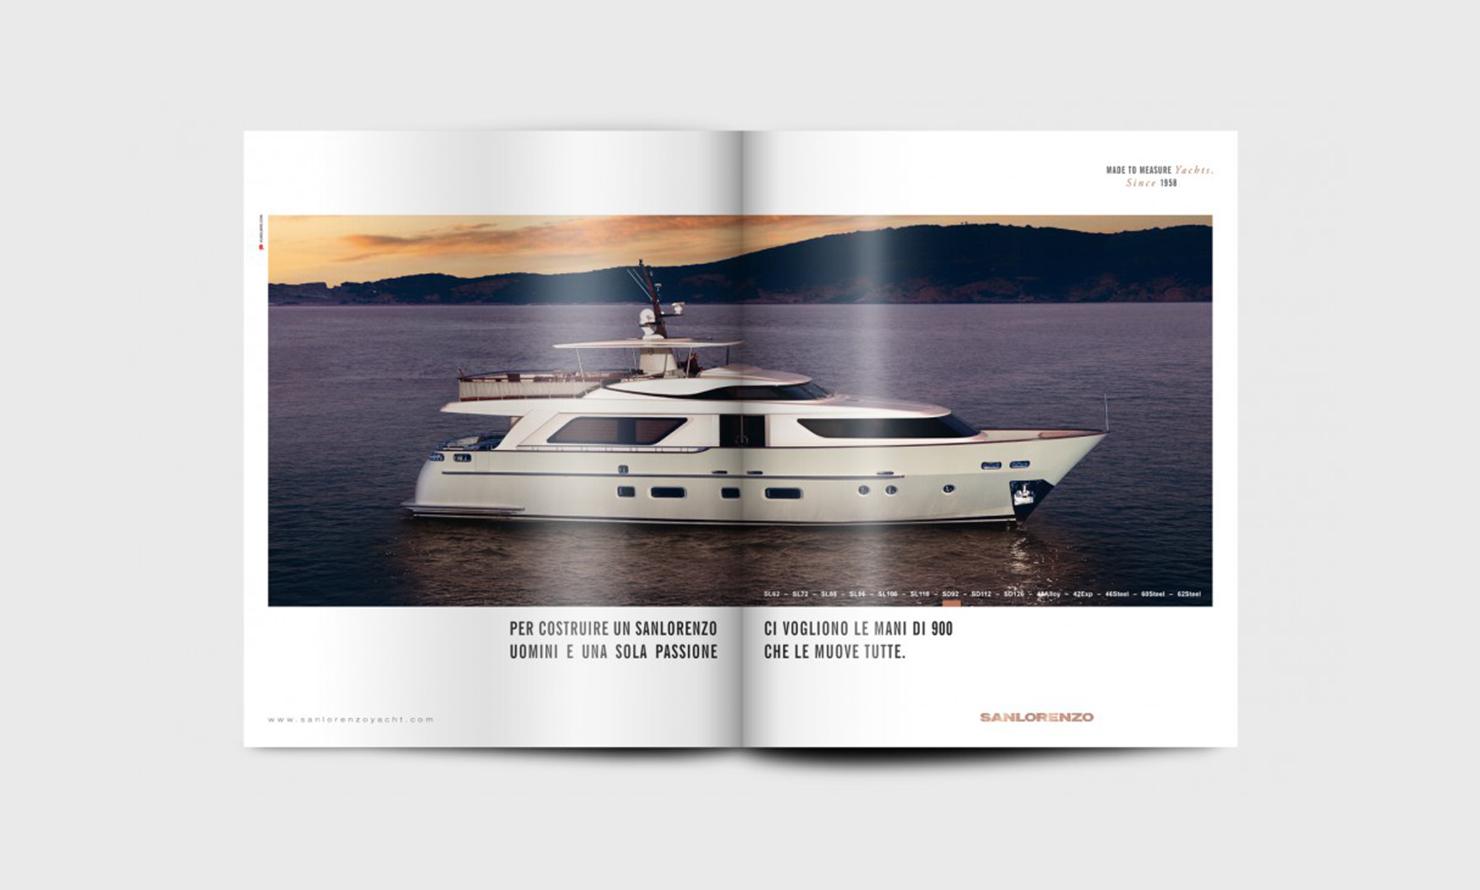 https://www.kubelibre.com/uploads/Slider-work-tutti-clienti/sanlorenzo-yacht-made-to-measure-yacht-since-1958-2.jpg